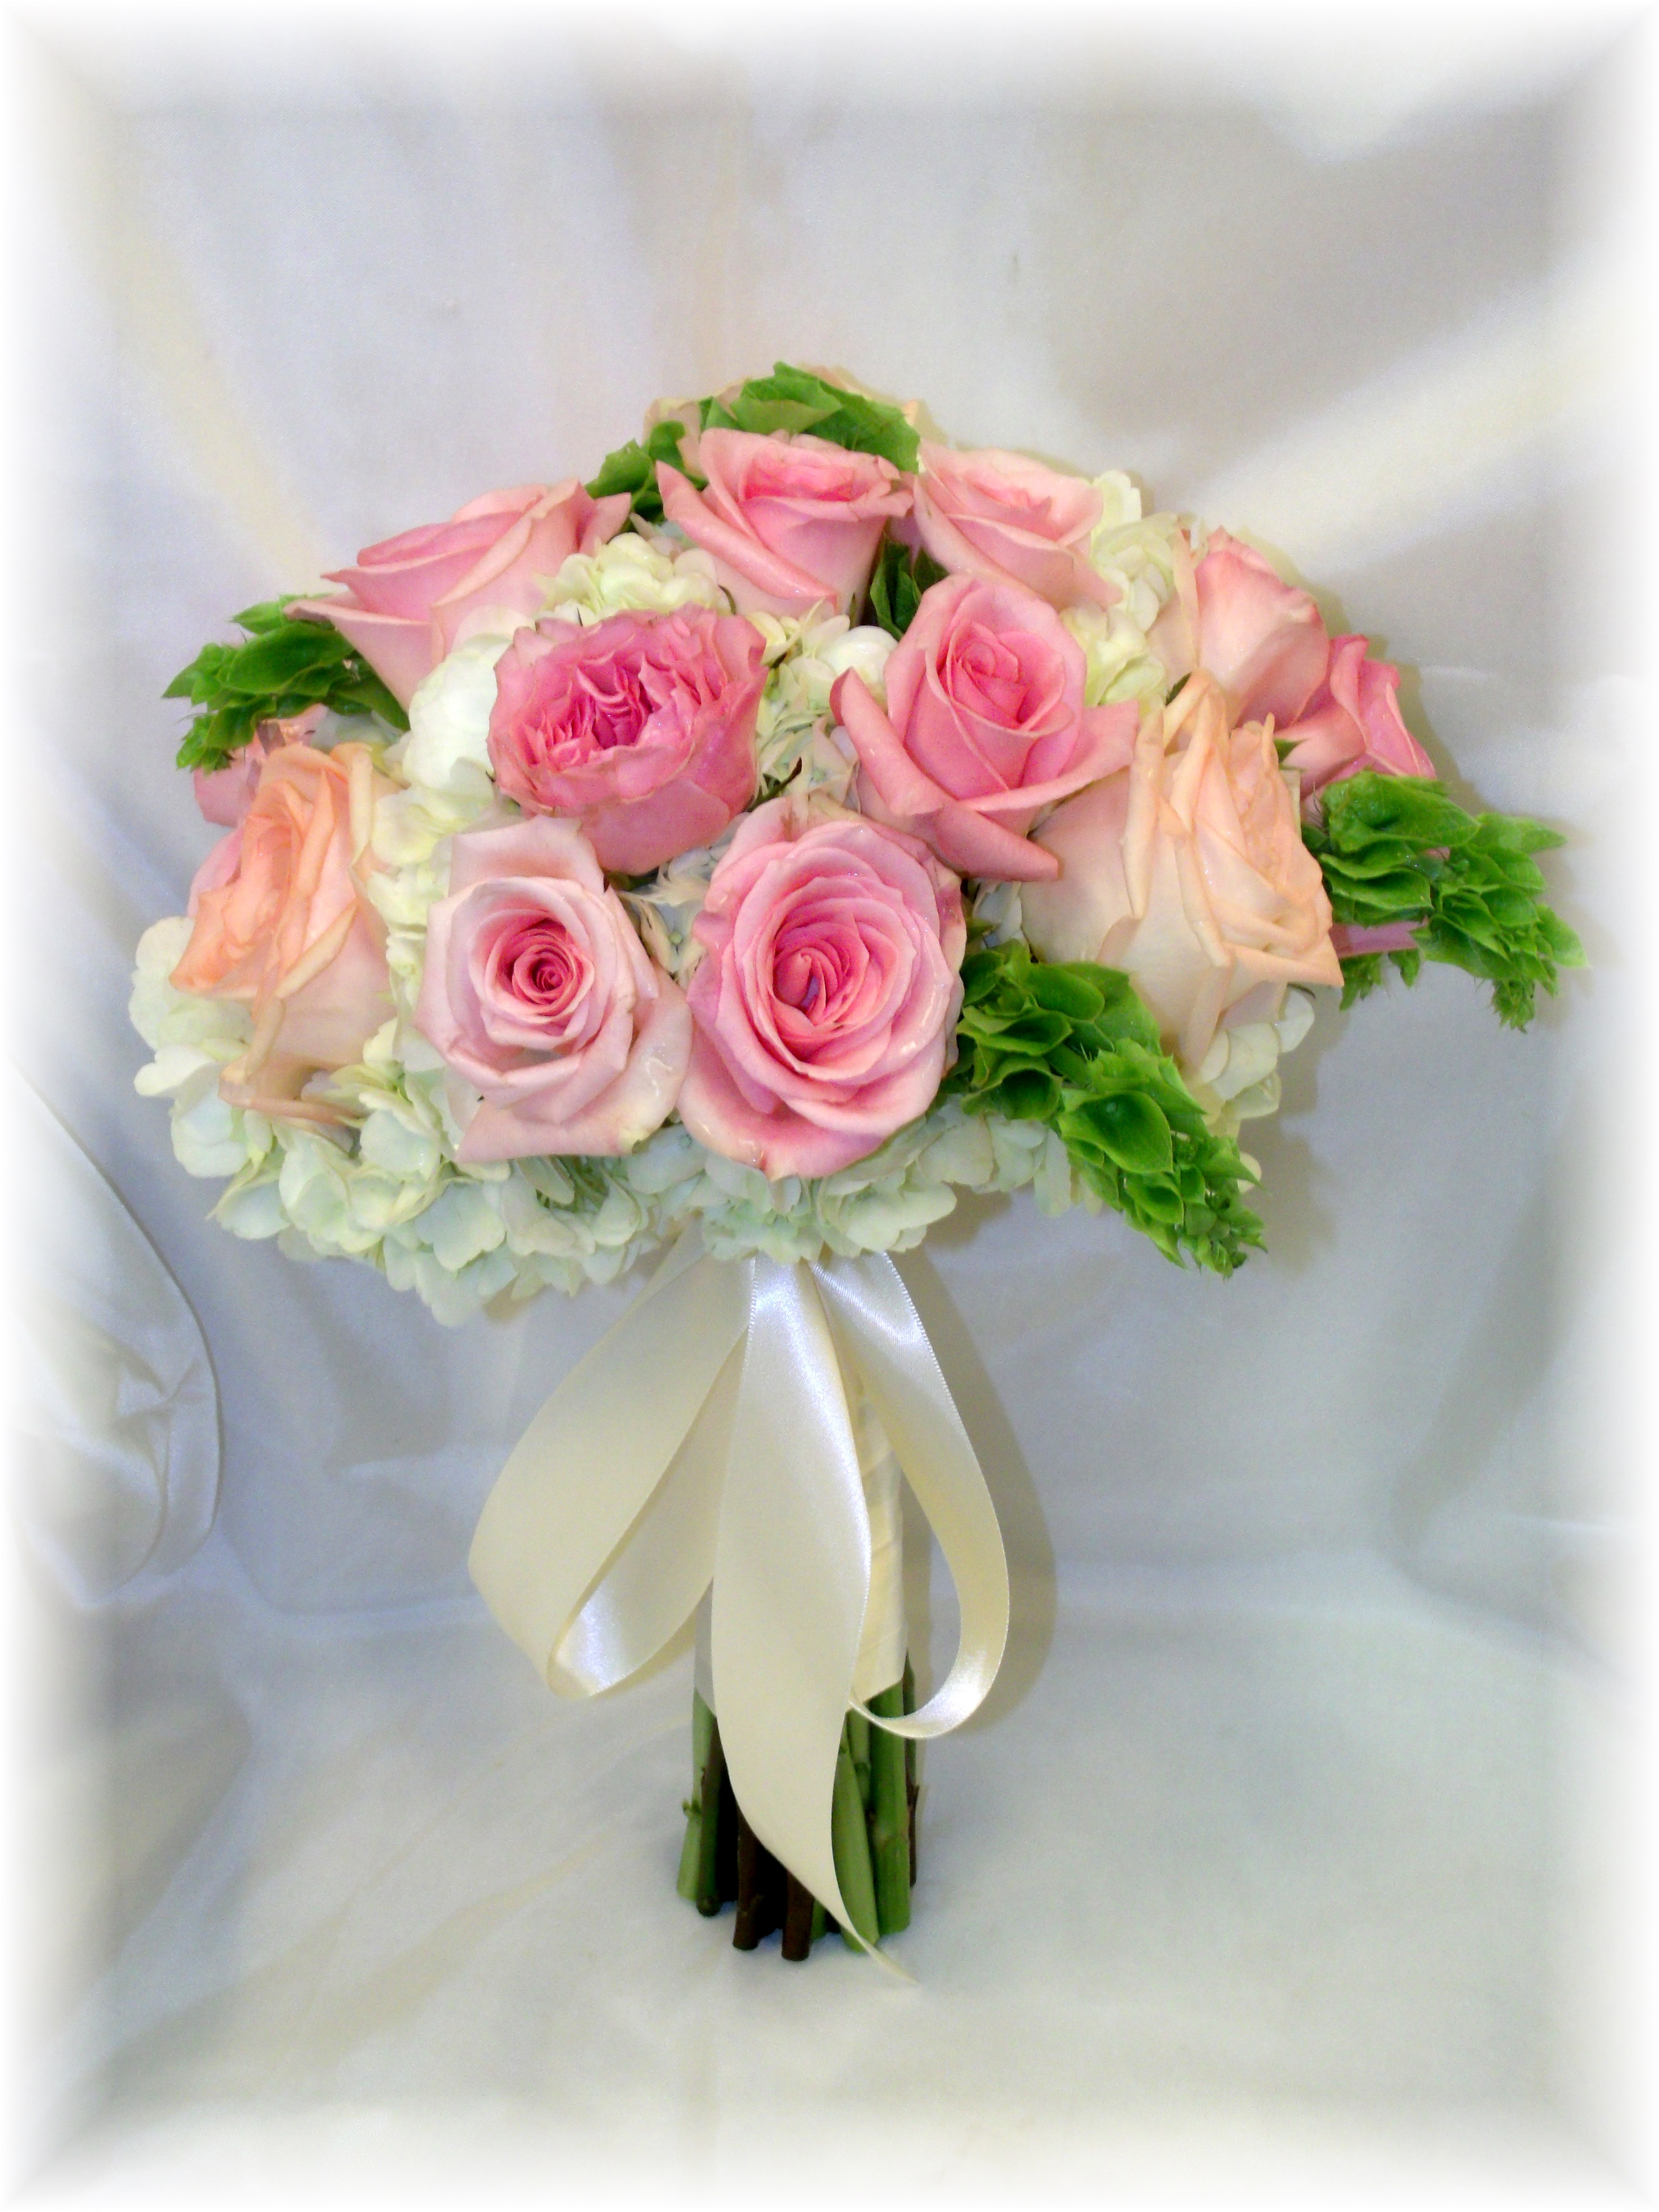 Roses, Hydrangea & Bells of Ireland